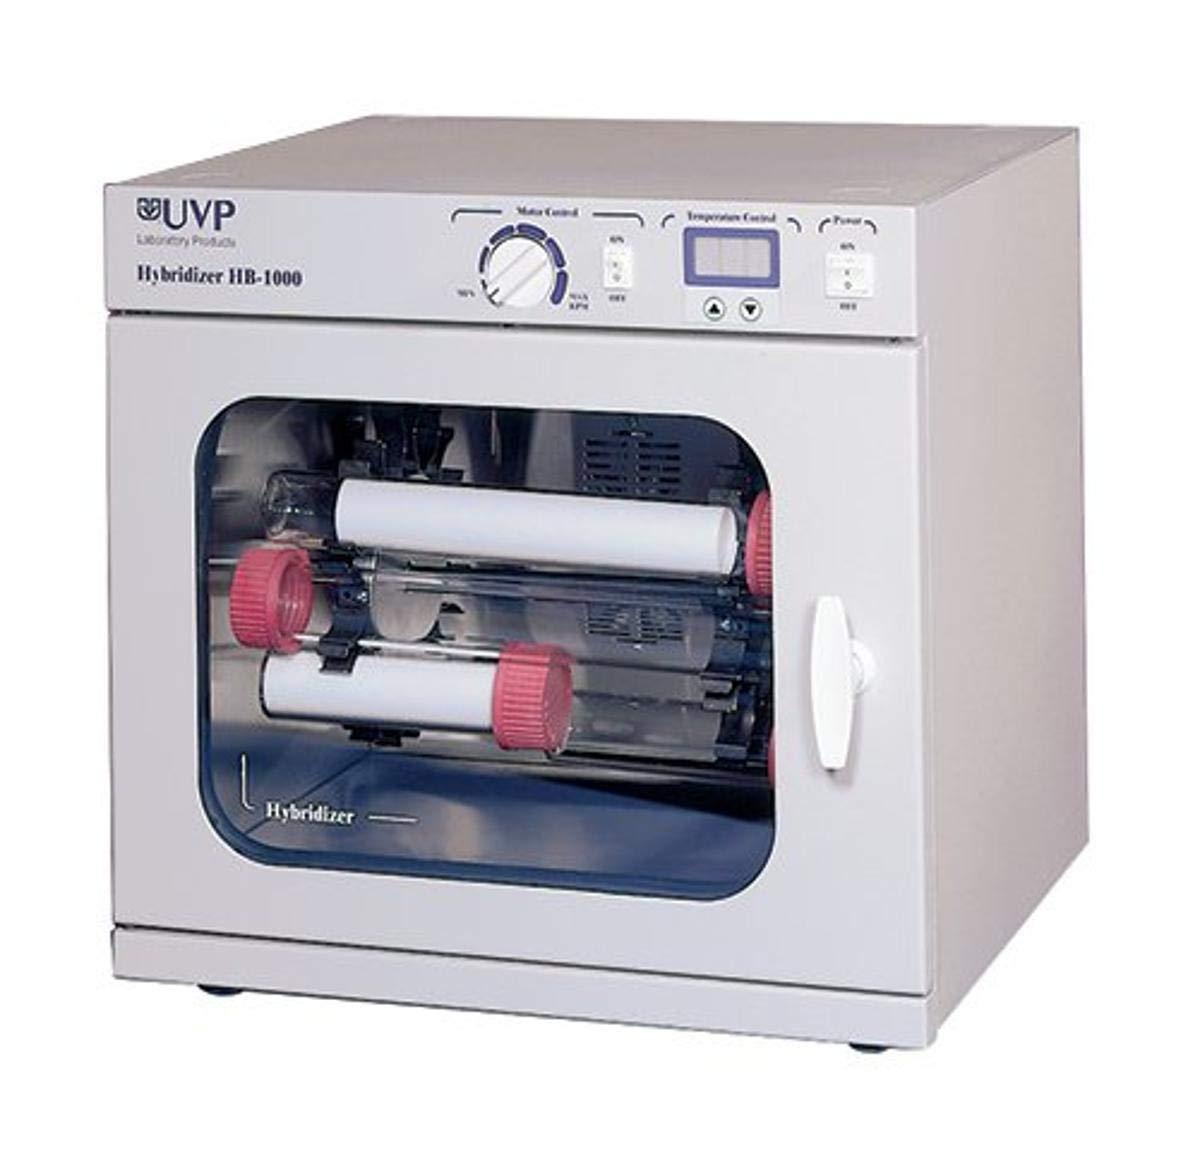 UVP 95-0030-02 Model HB-1000 Oven Houston Mall Hybridization Seattle Mall Hybridizer 230V